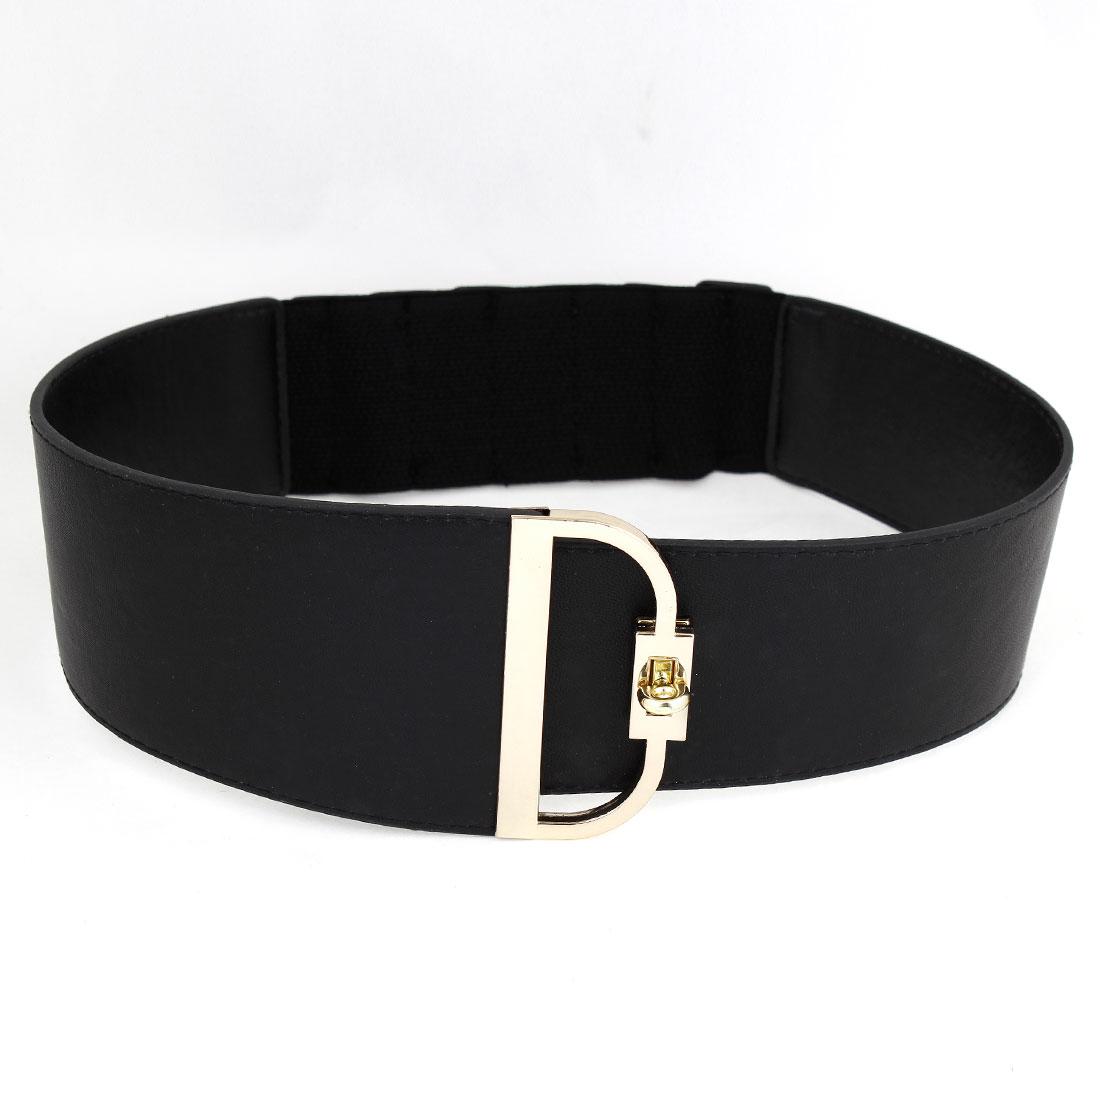 Woman Lady Black Faux Leather Wrapped Metal Turn Lock Buckle Cinch Belt